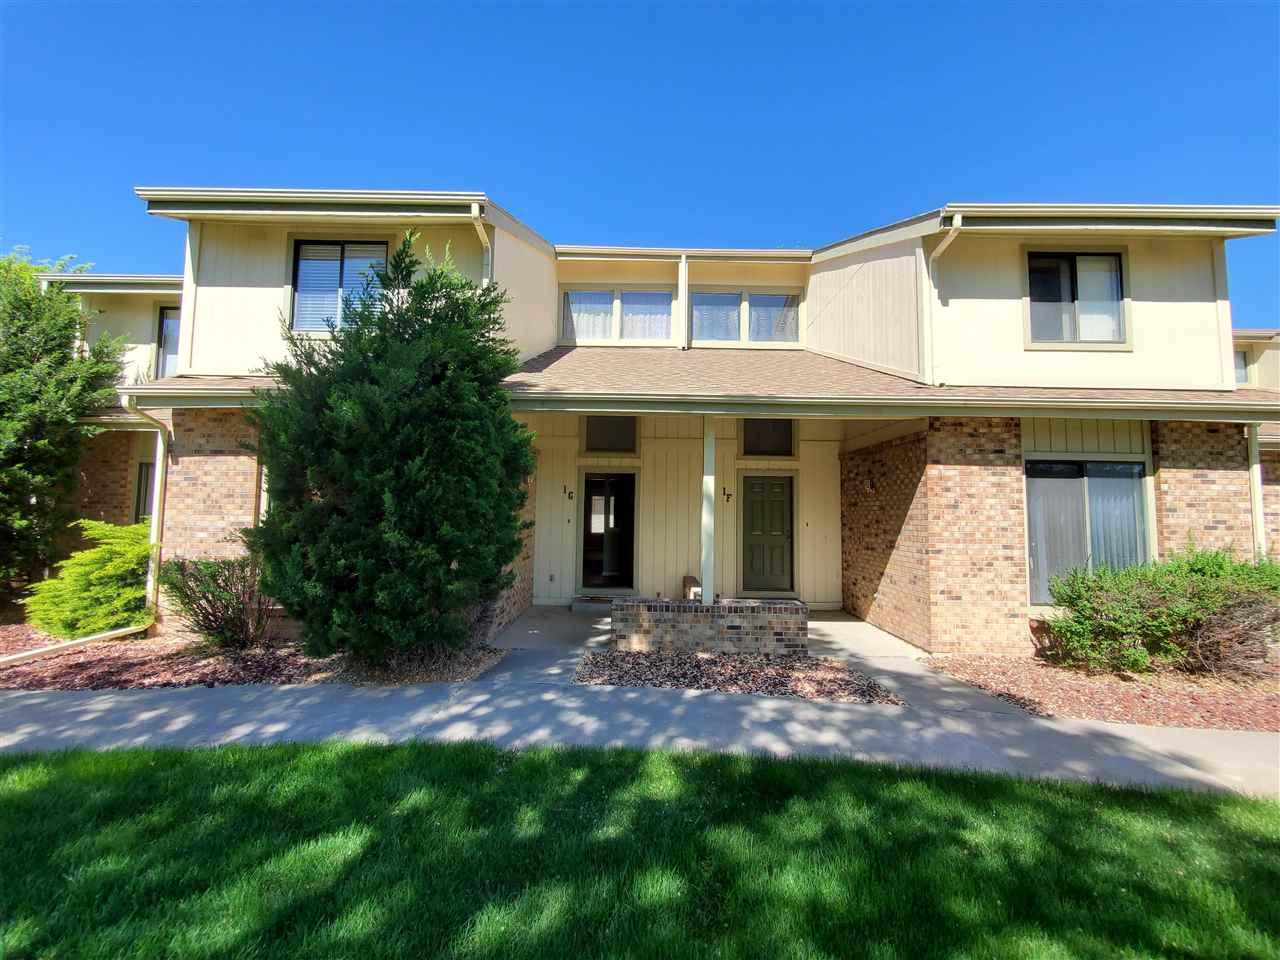 2675 Springside Court #1G Property Photo - Grand Junction, CO real estate listing